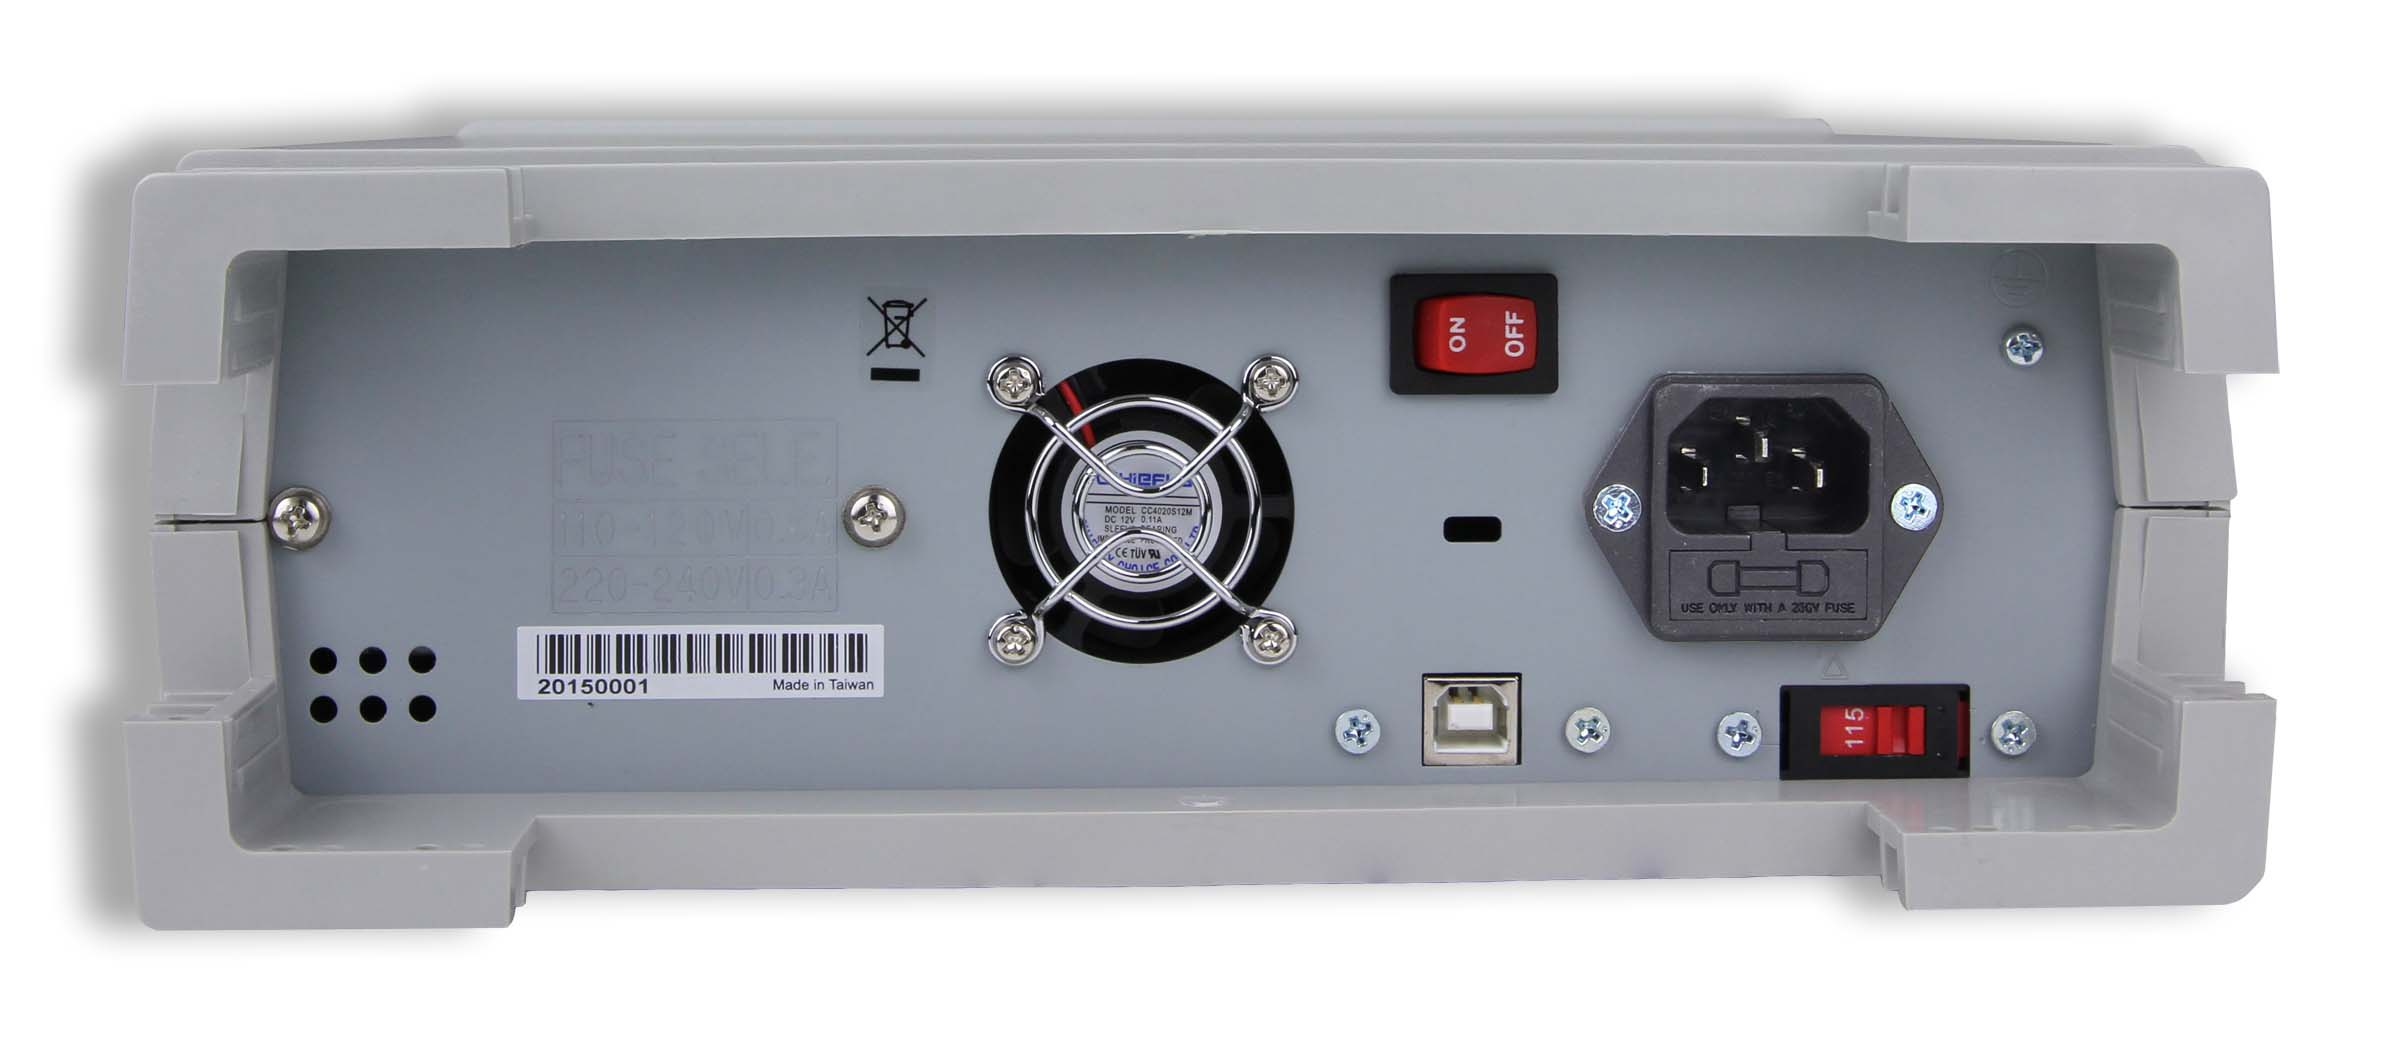 Lcr Meter High Voltage : Lcr khz high precision meter